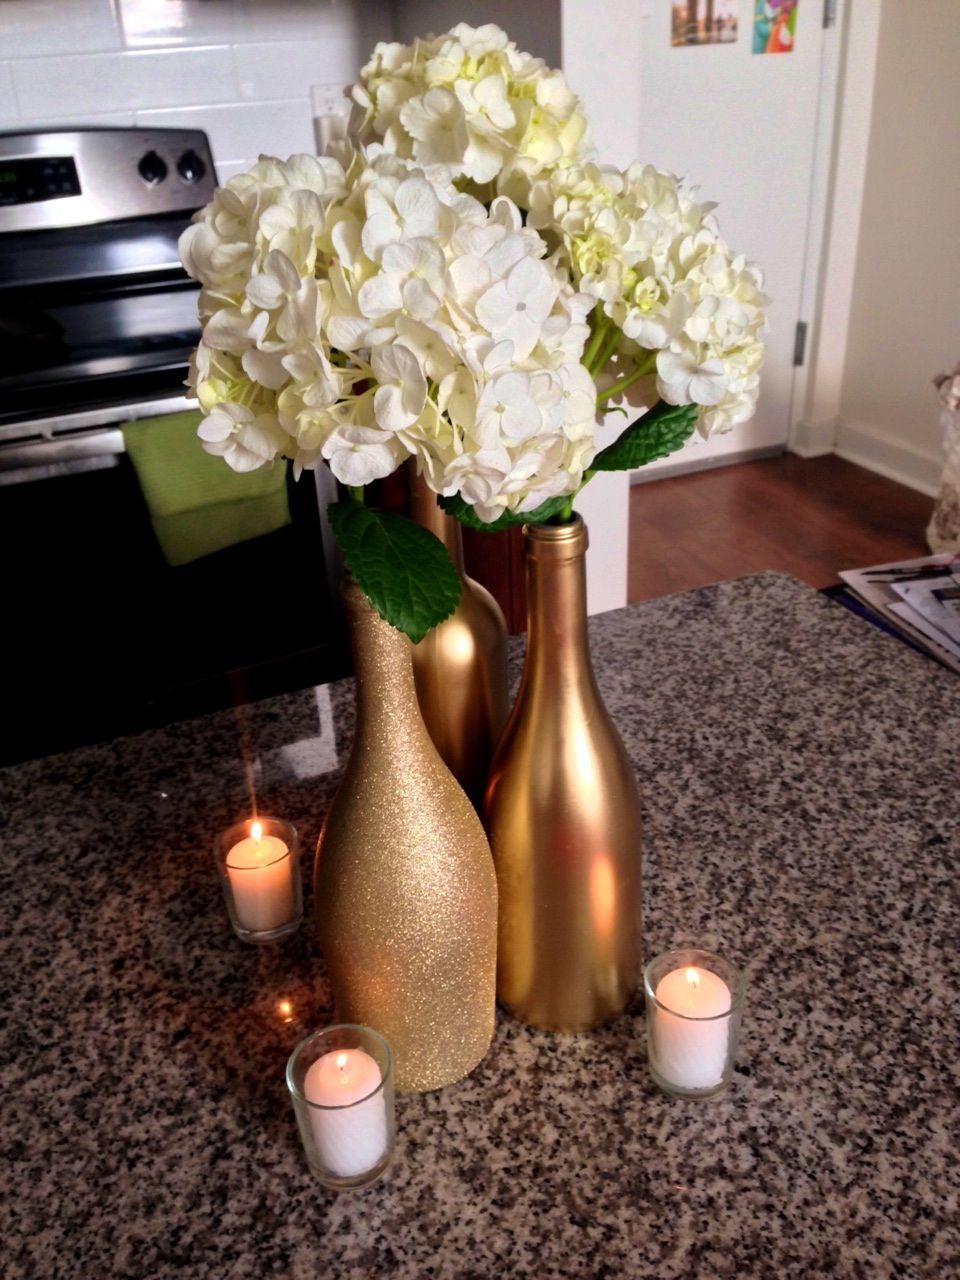 Xmas Centerpieces Furnituremagnificent Wine Bottle Centerpiece Mock Up Complete